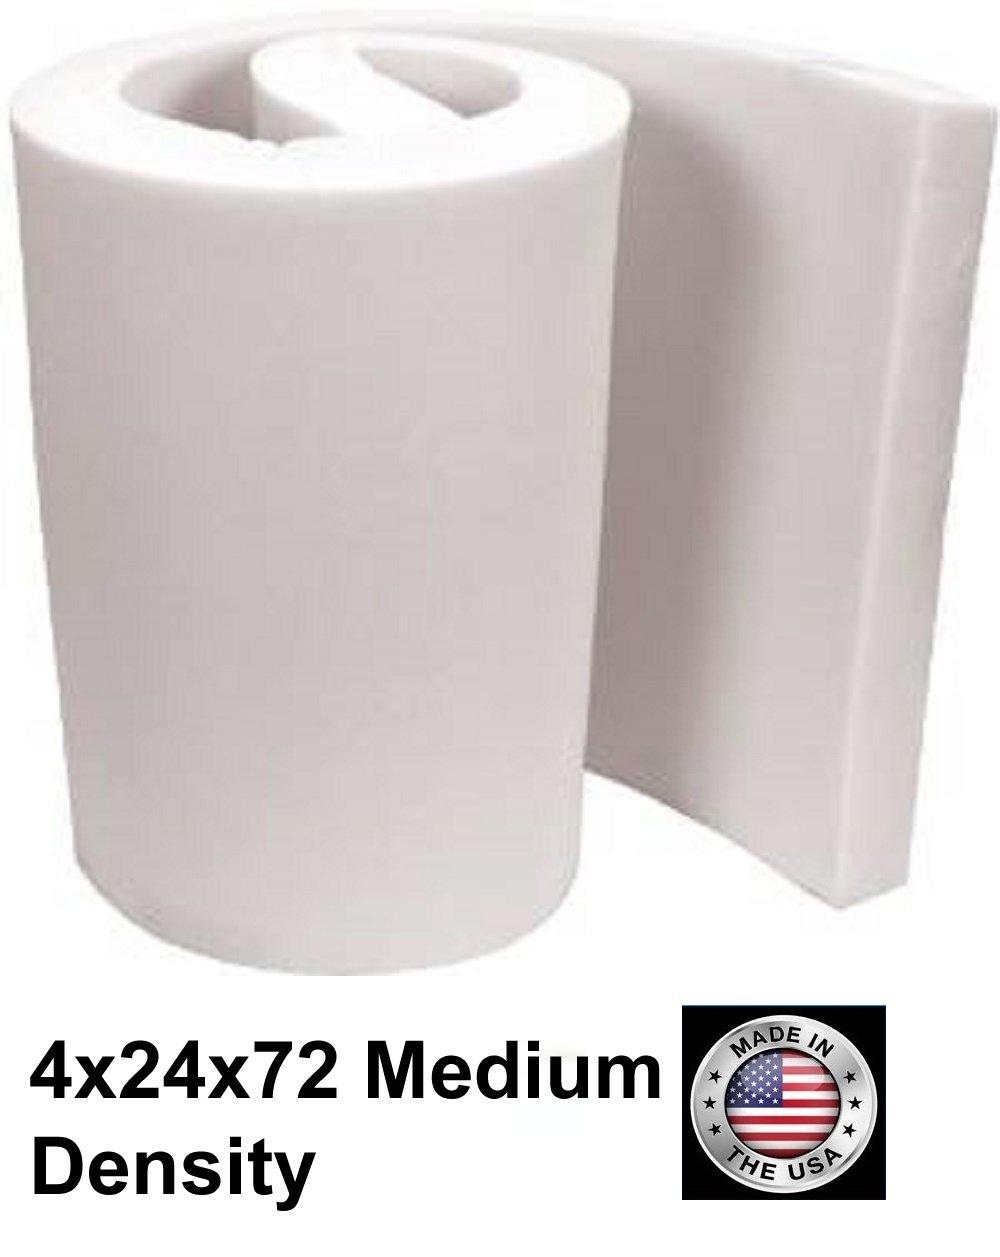 FoamTouch Upholstery Foam Cushion Medium Density Standard, 4'' L x 24'' W x 72'' H